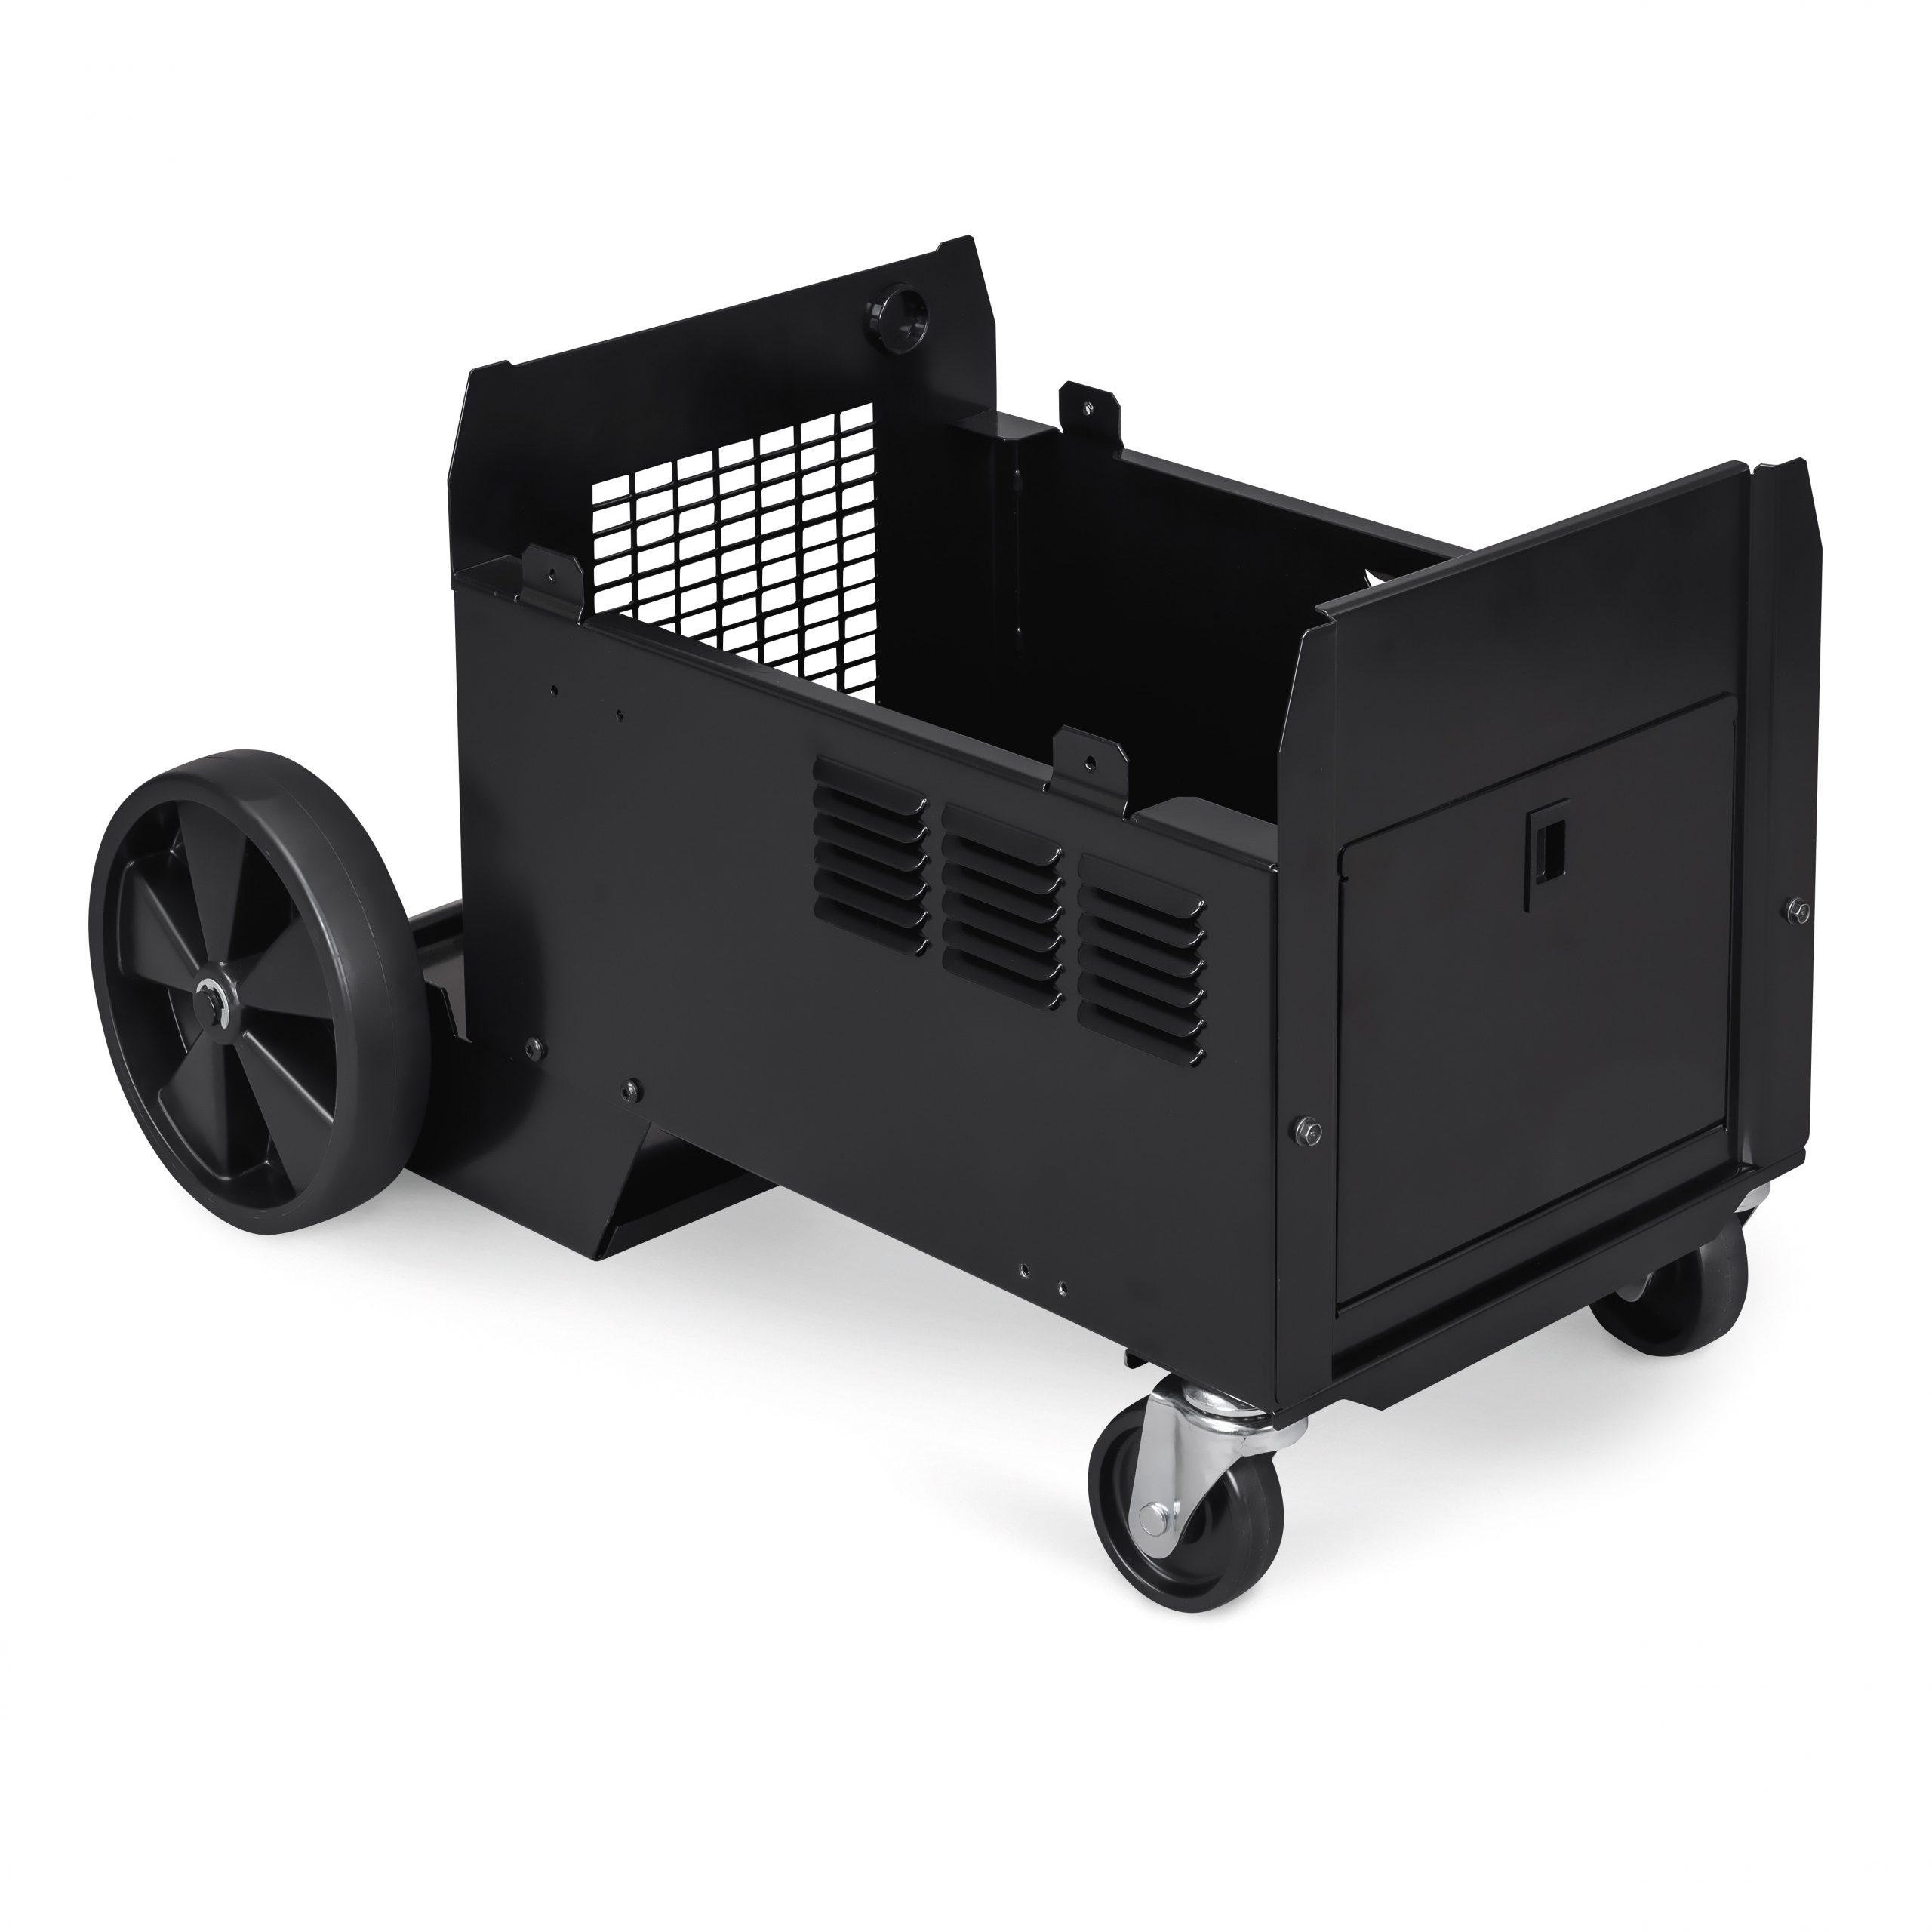 Syncrowave® 300/400 4-Wheel Cart